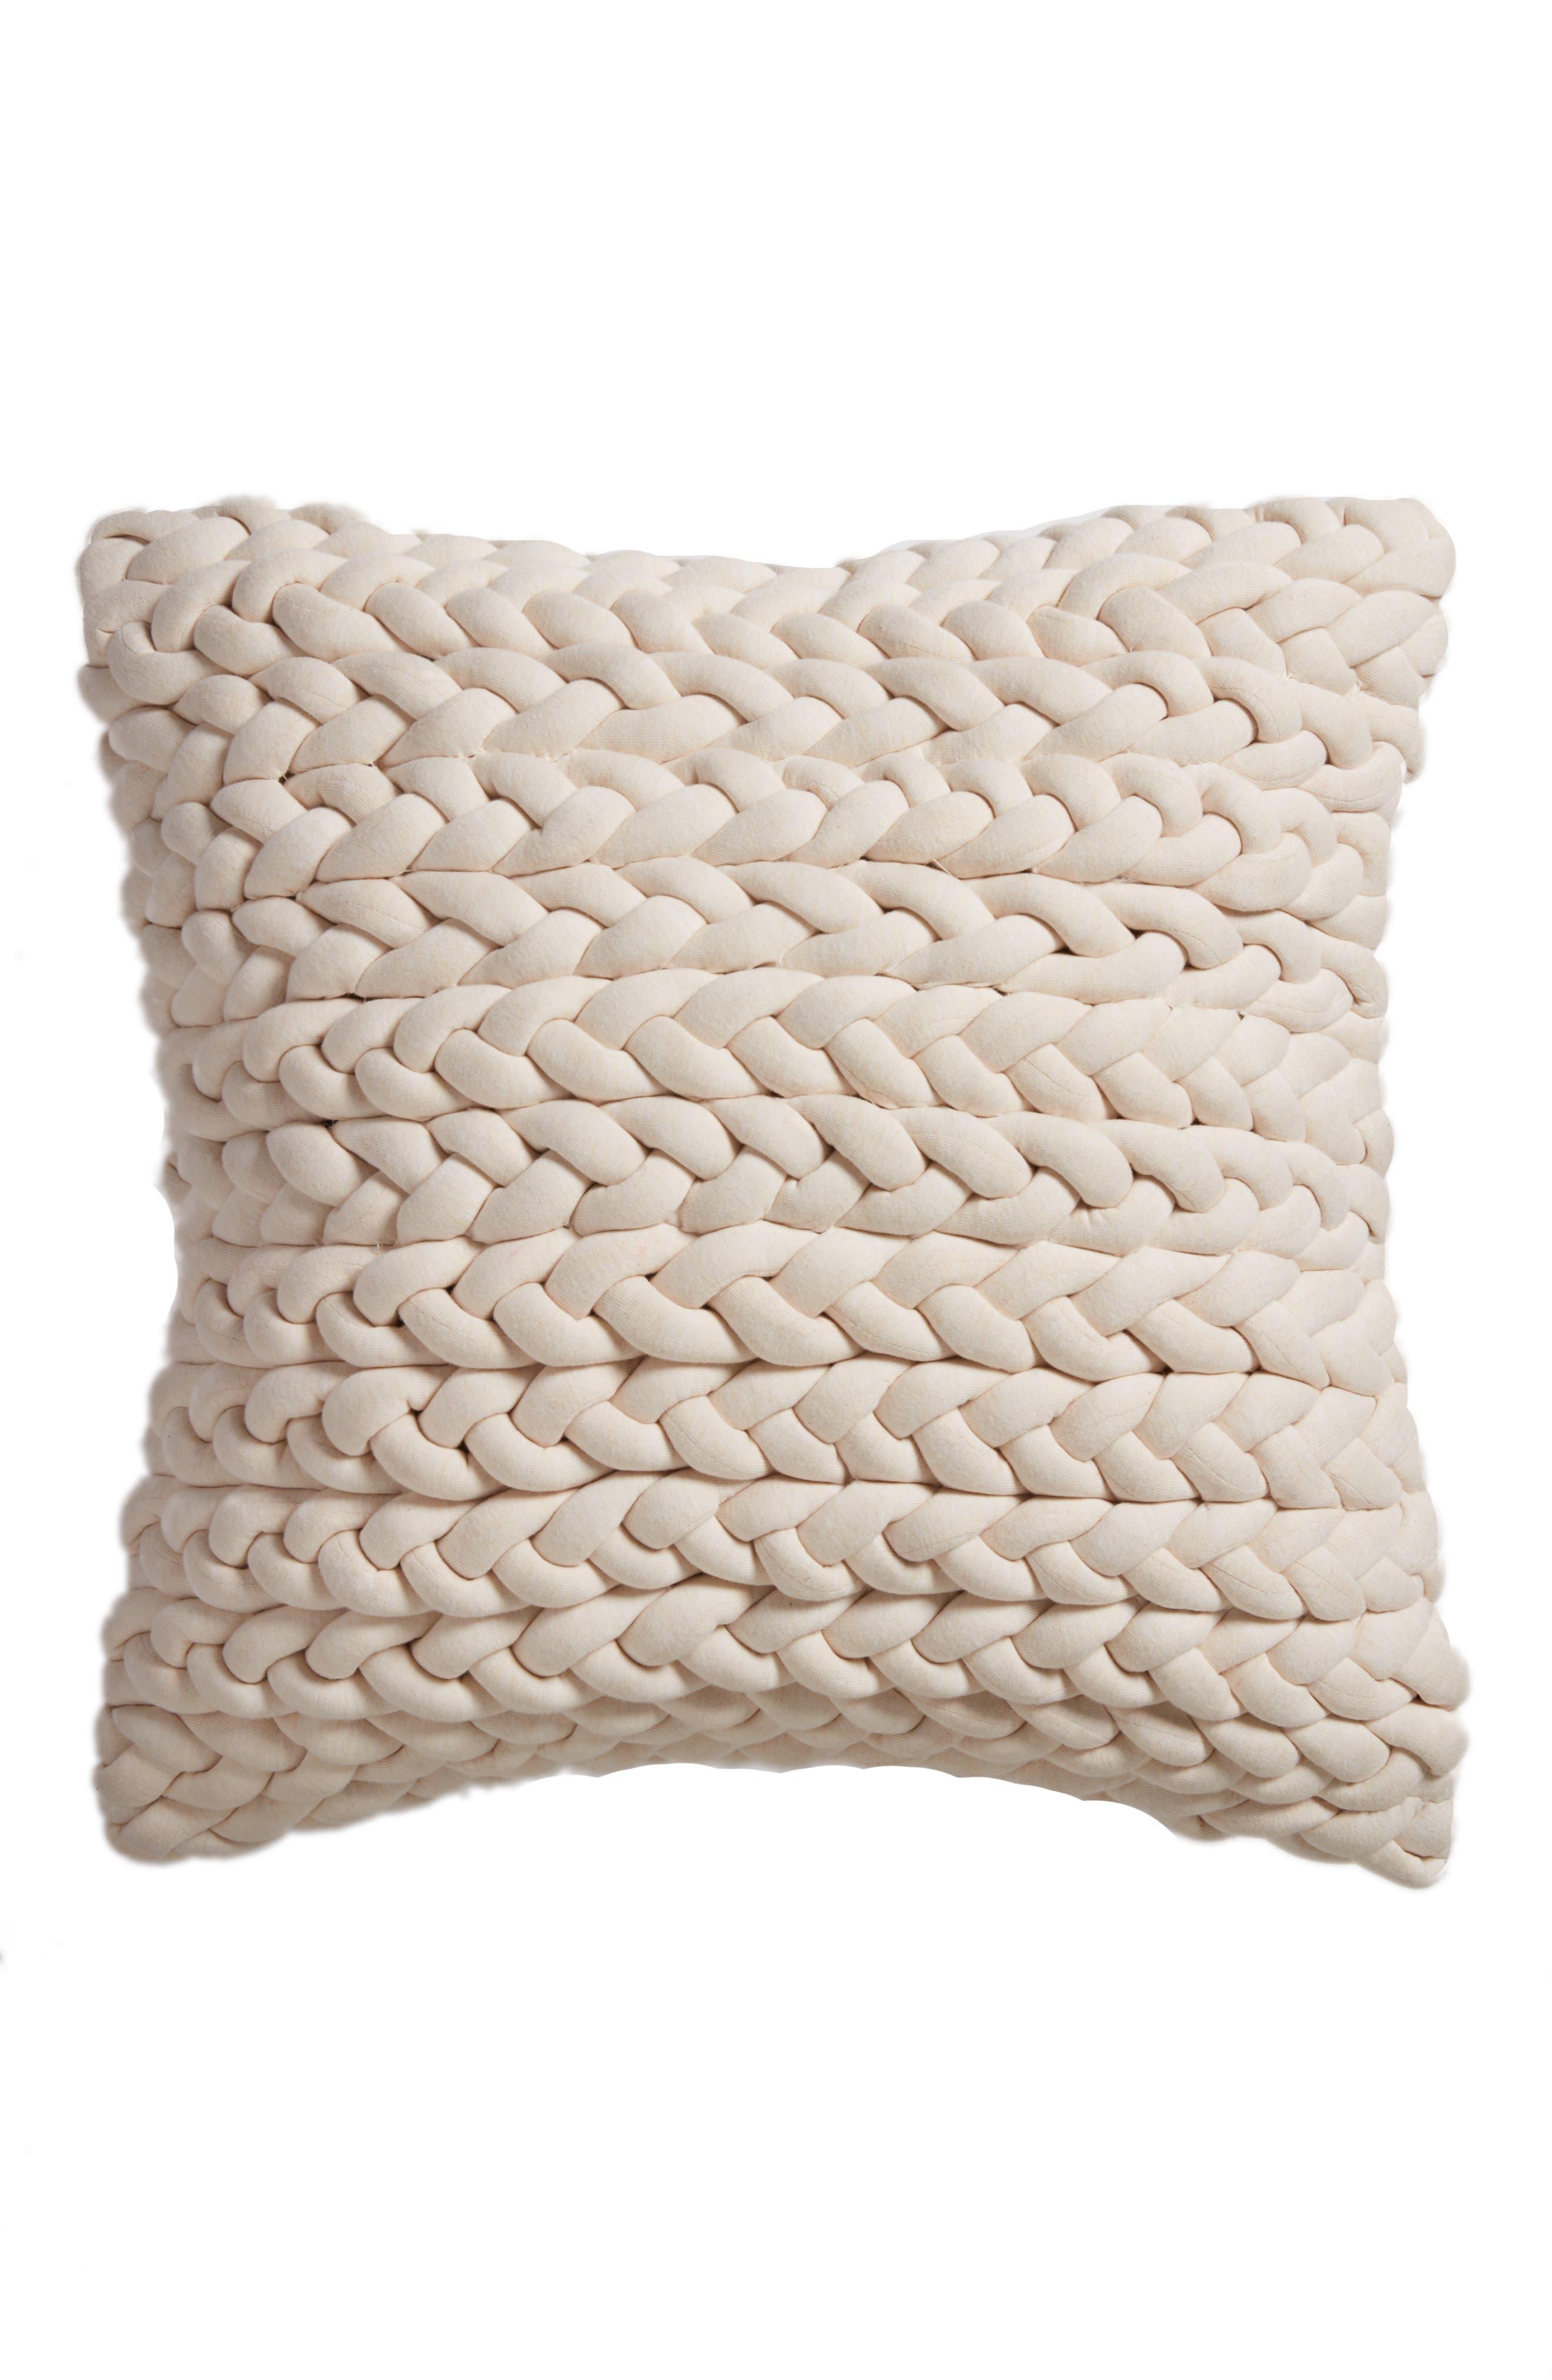 Alternate Image 1 Selected - Treasure & Bond Jersey Braid Accent Pillow